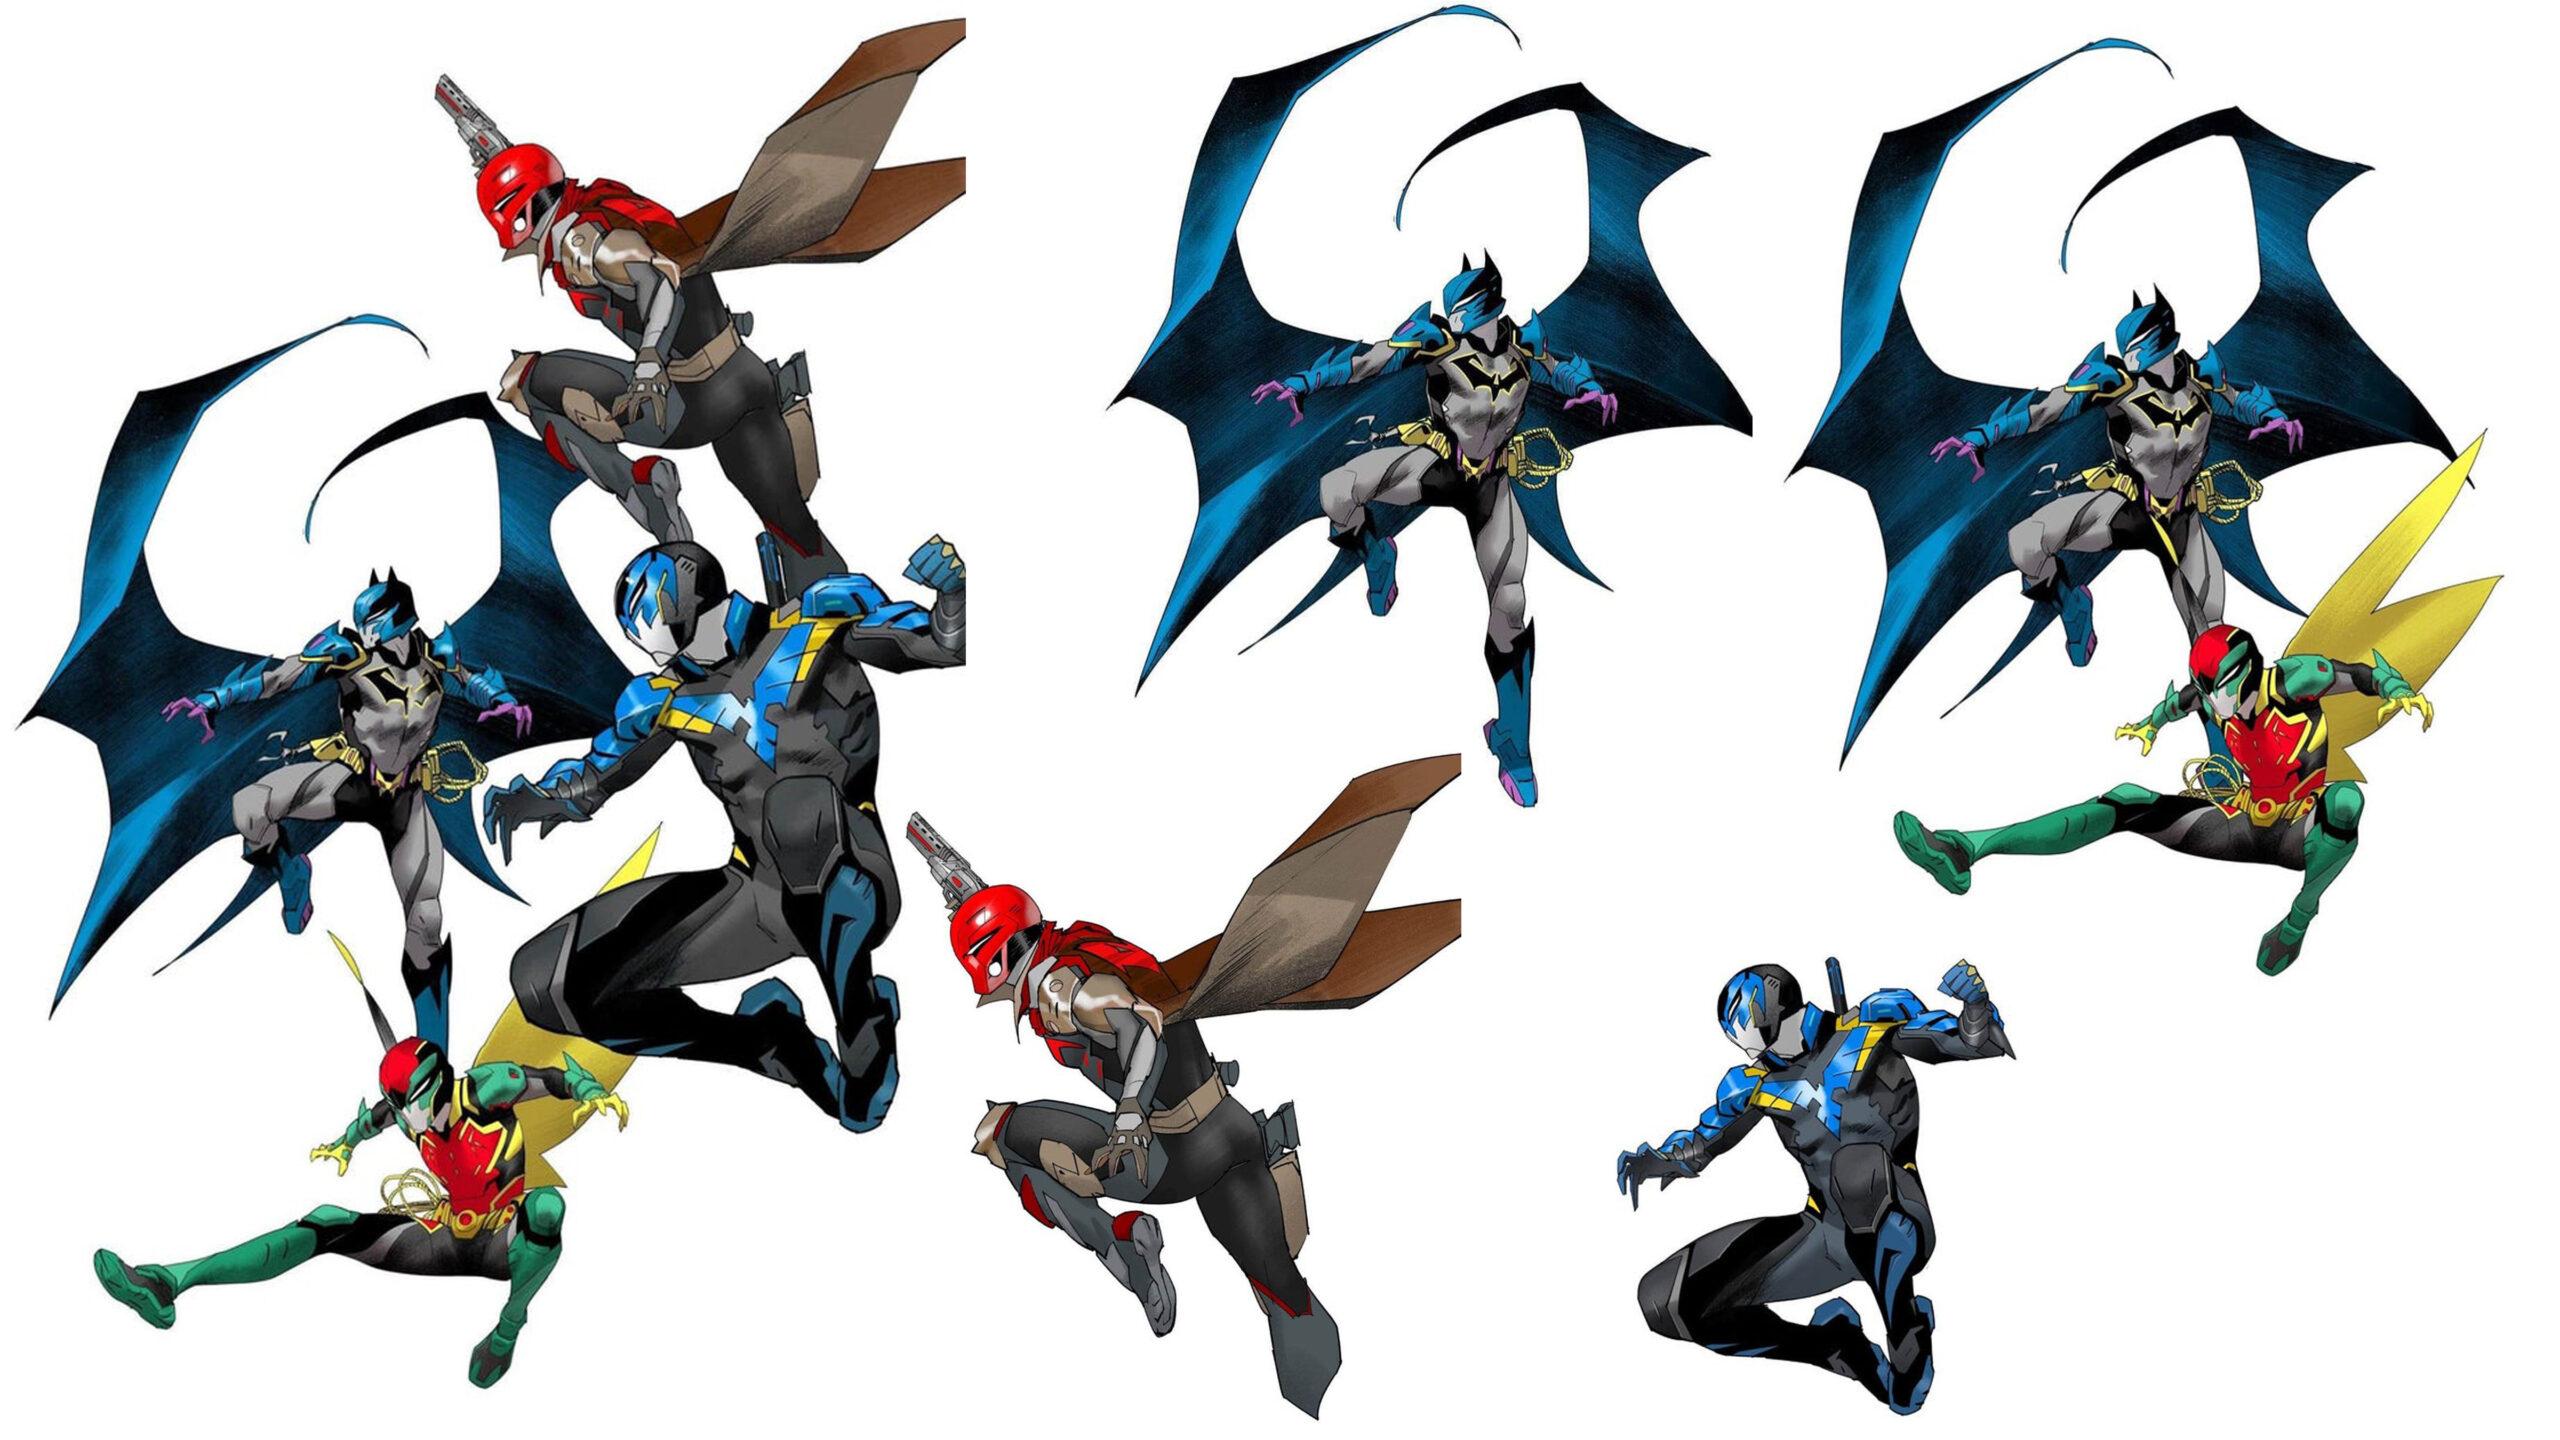 Power Rangers Artist Discloses New Batman Family Ranger Designs : Batman & Robin, Nightwing, Redhood, Batman & Sons